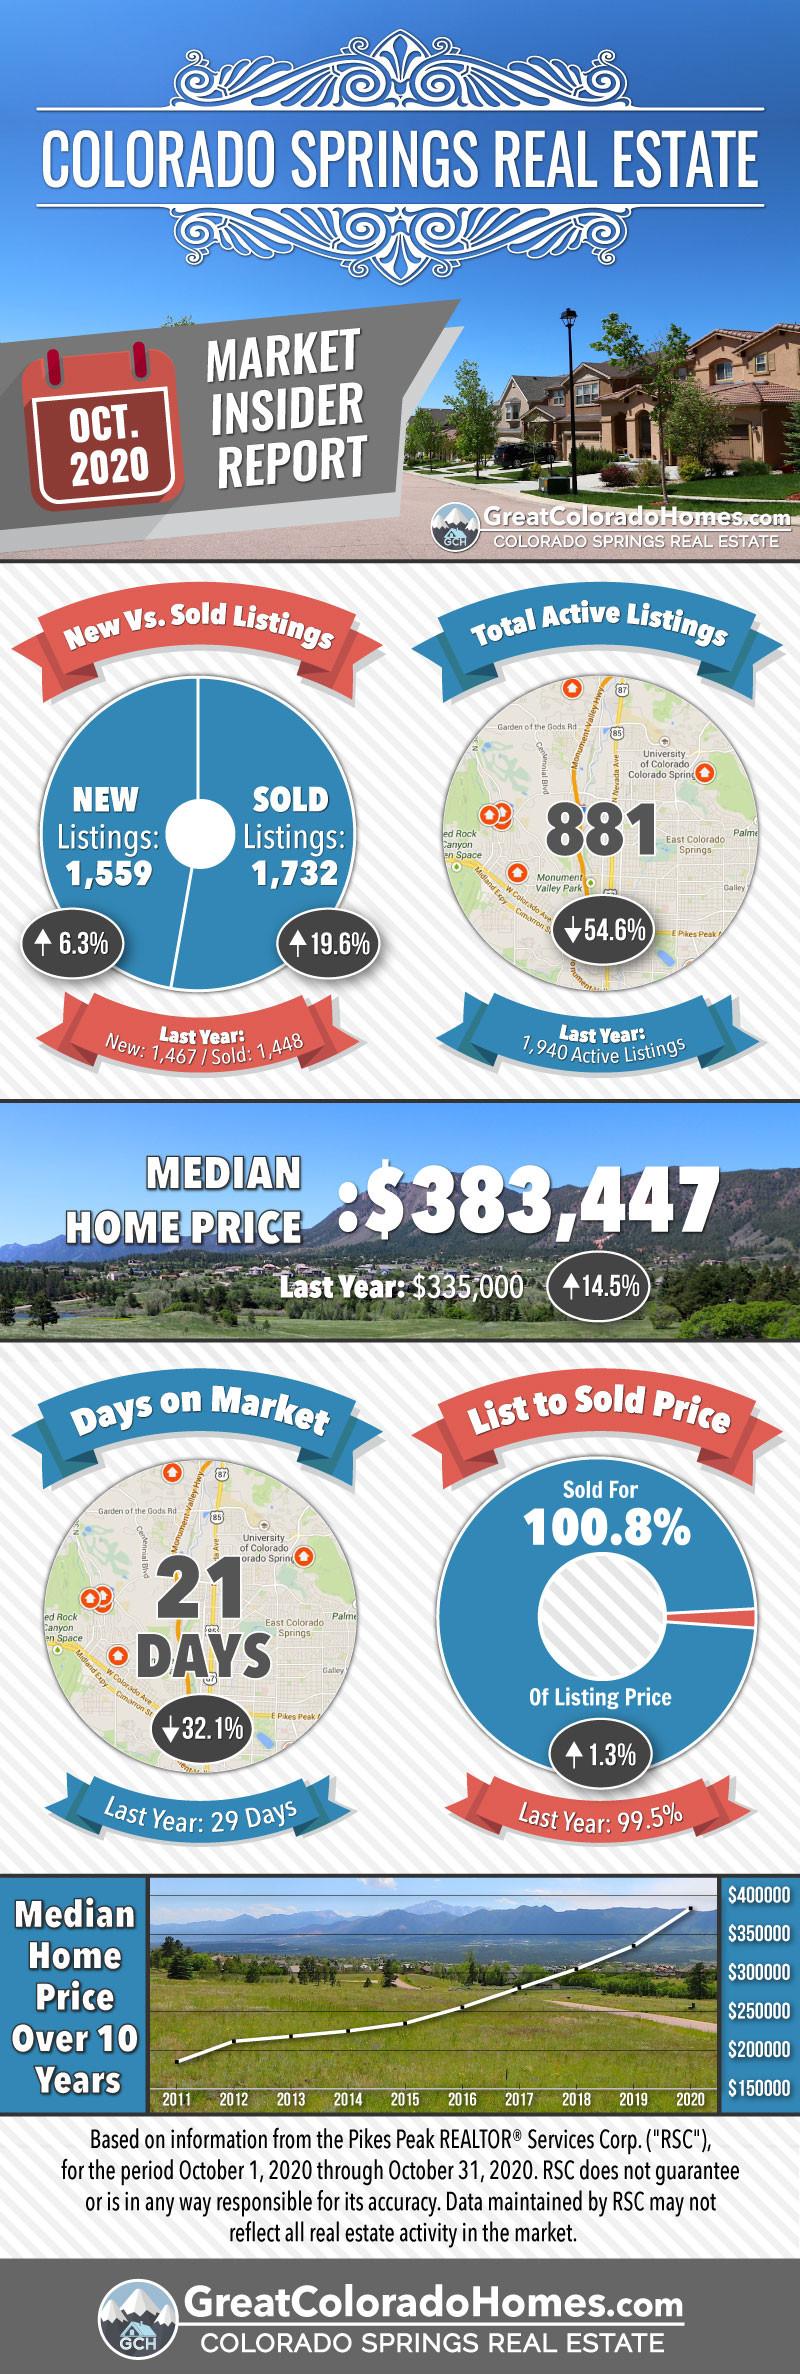 Septmeber 2020 Colorado Springs Real Estate Market Statistics Infographic